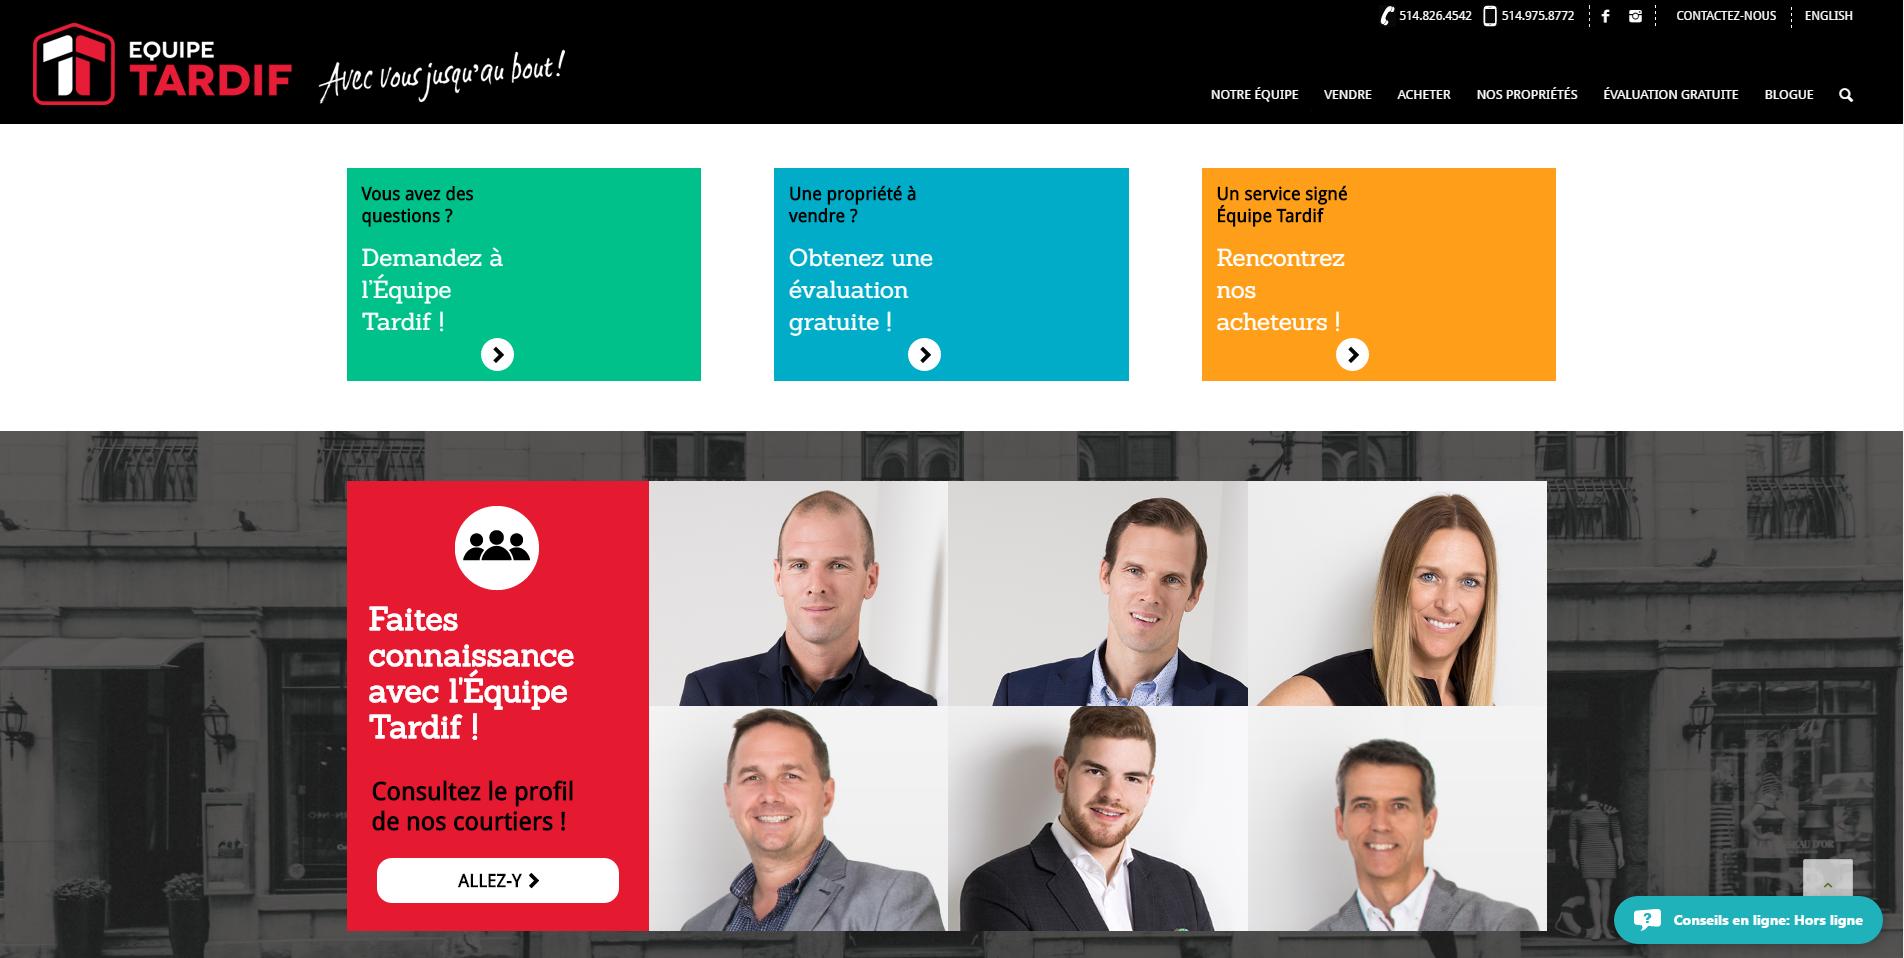 Équipe Tardif - homepage